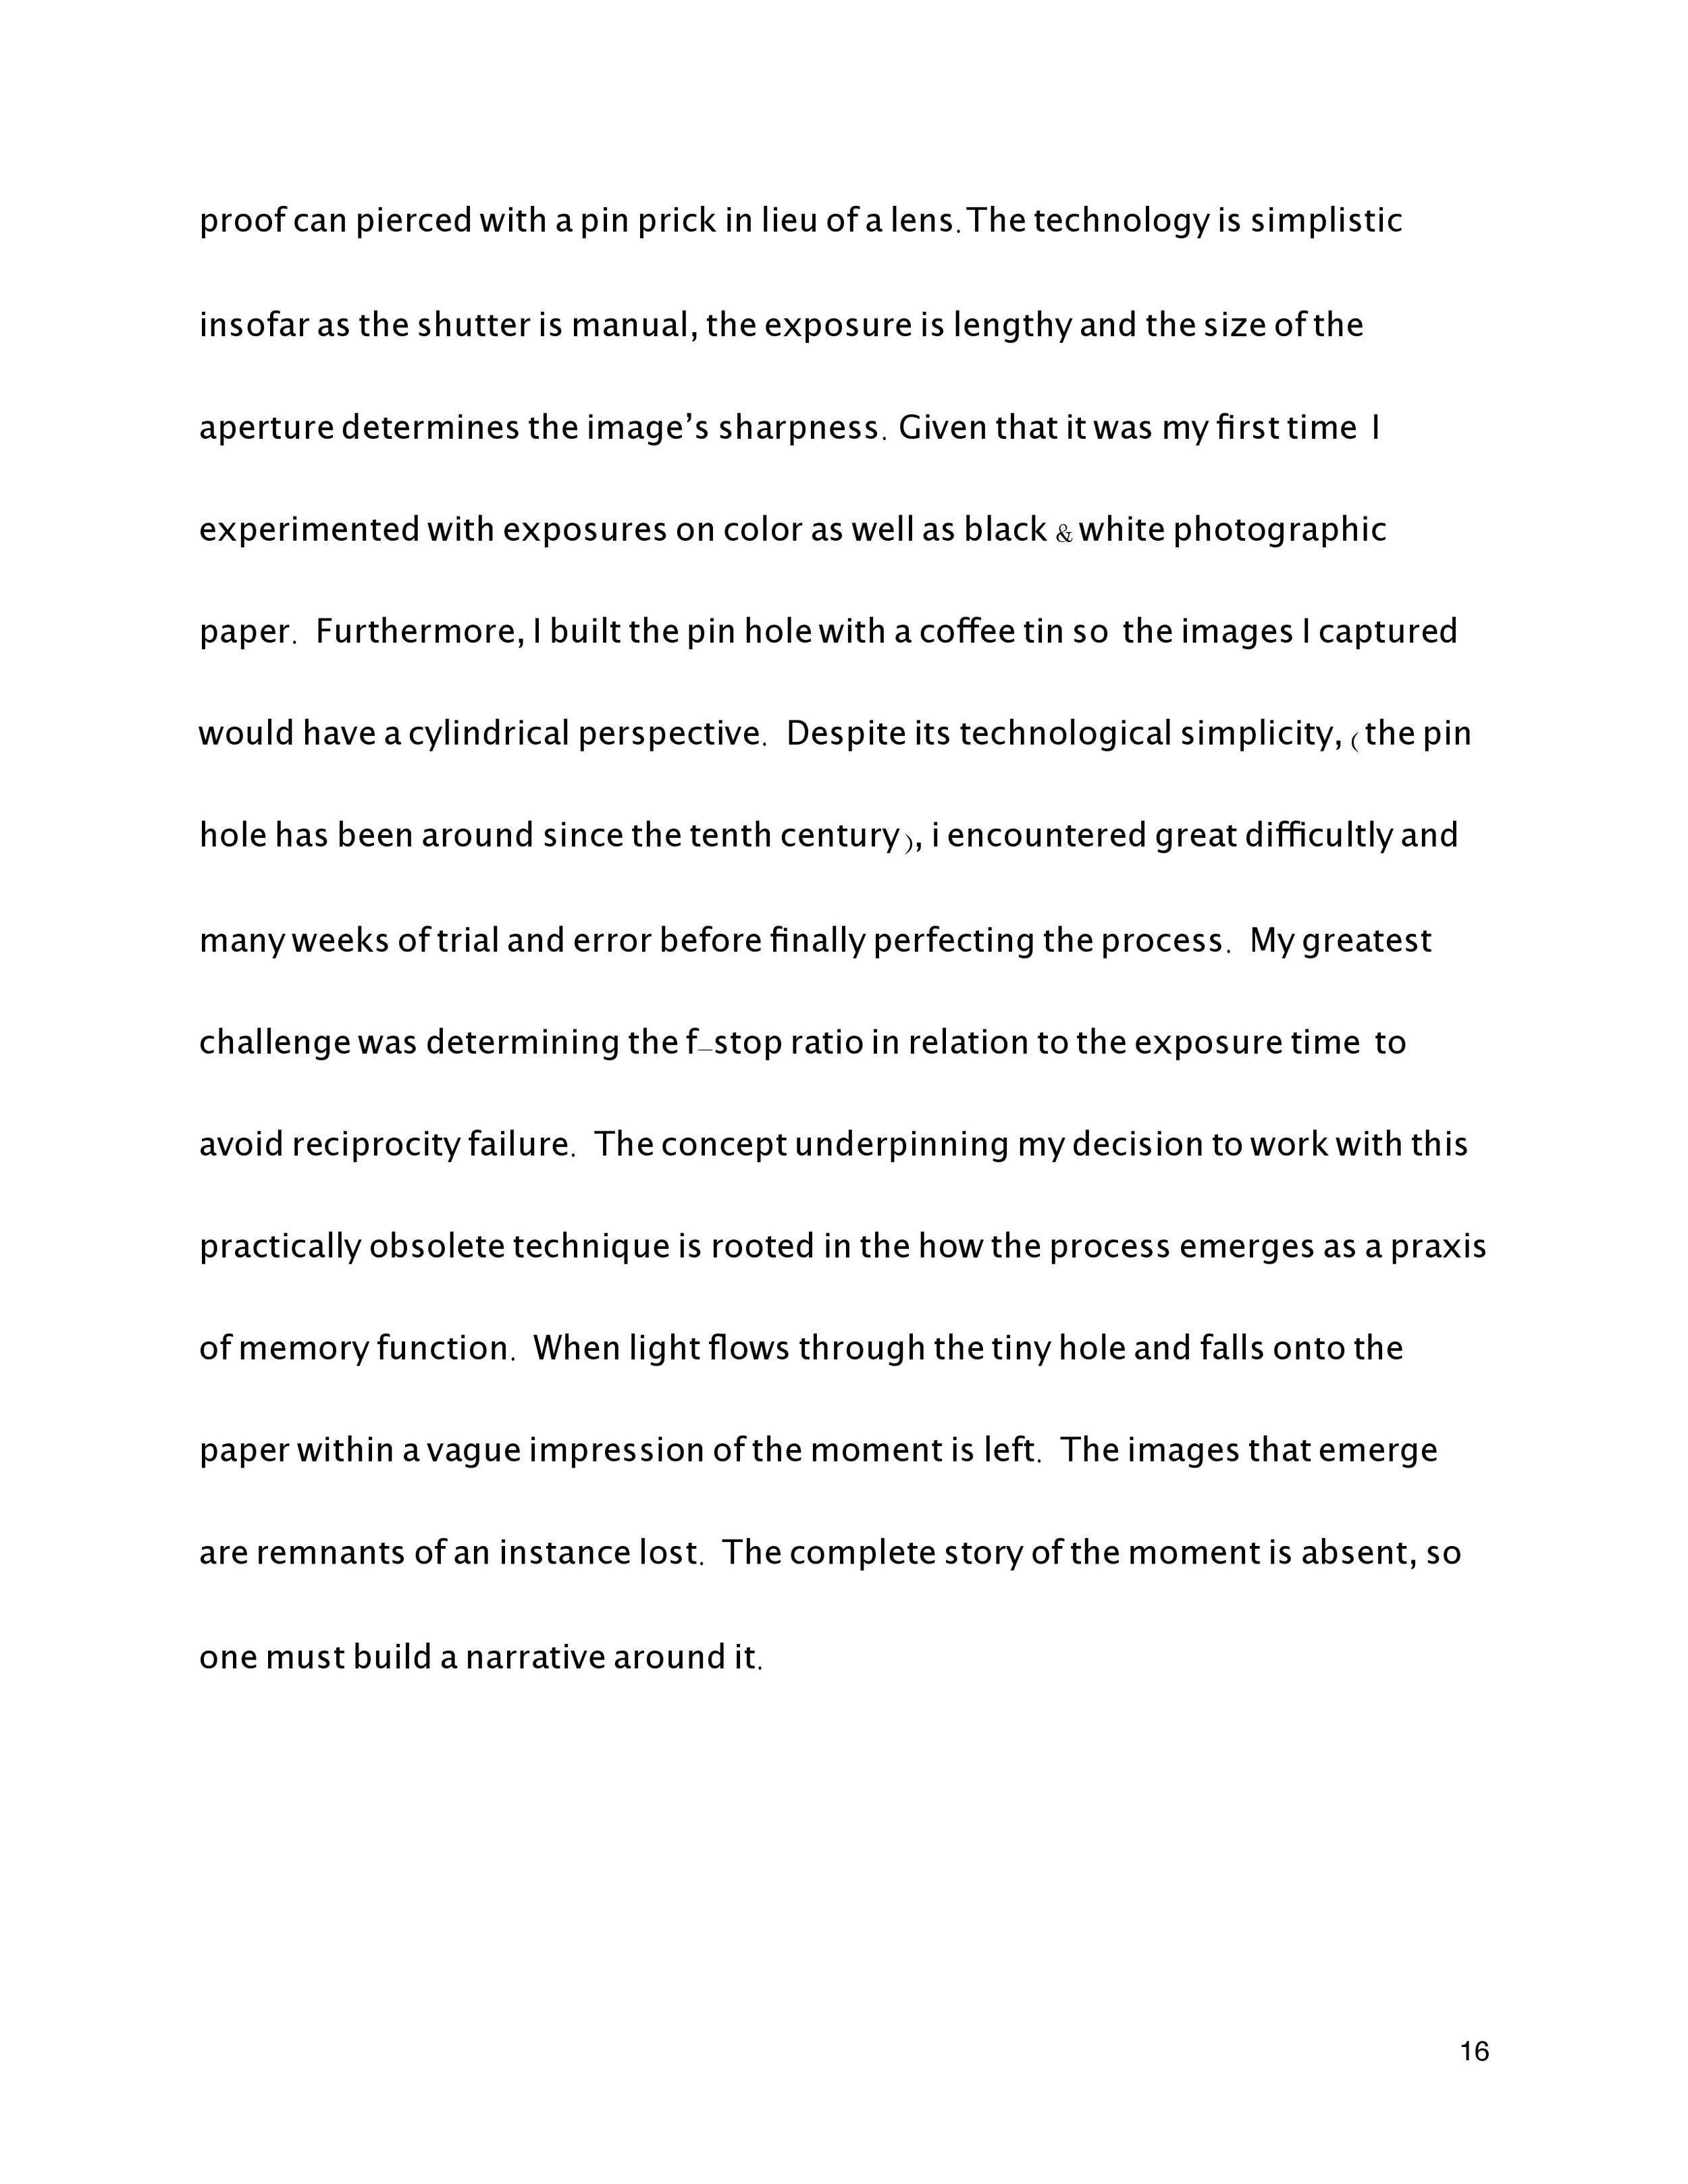 Post-Memory Proposal-page-016.jpg